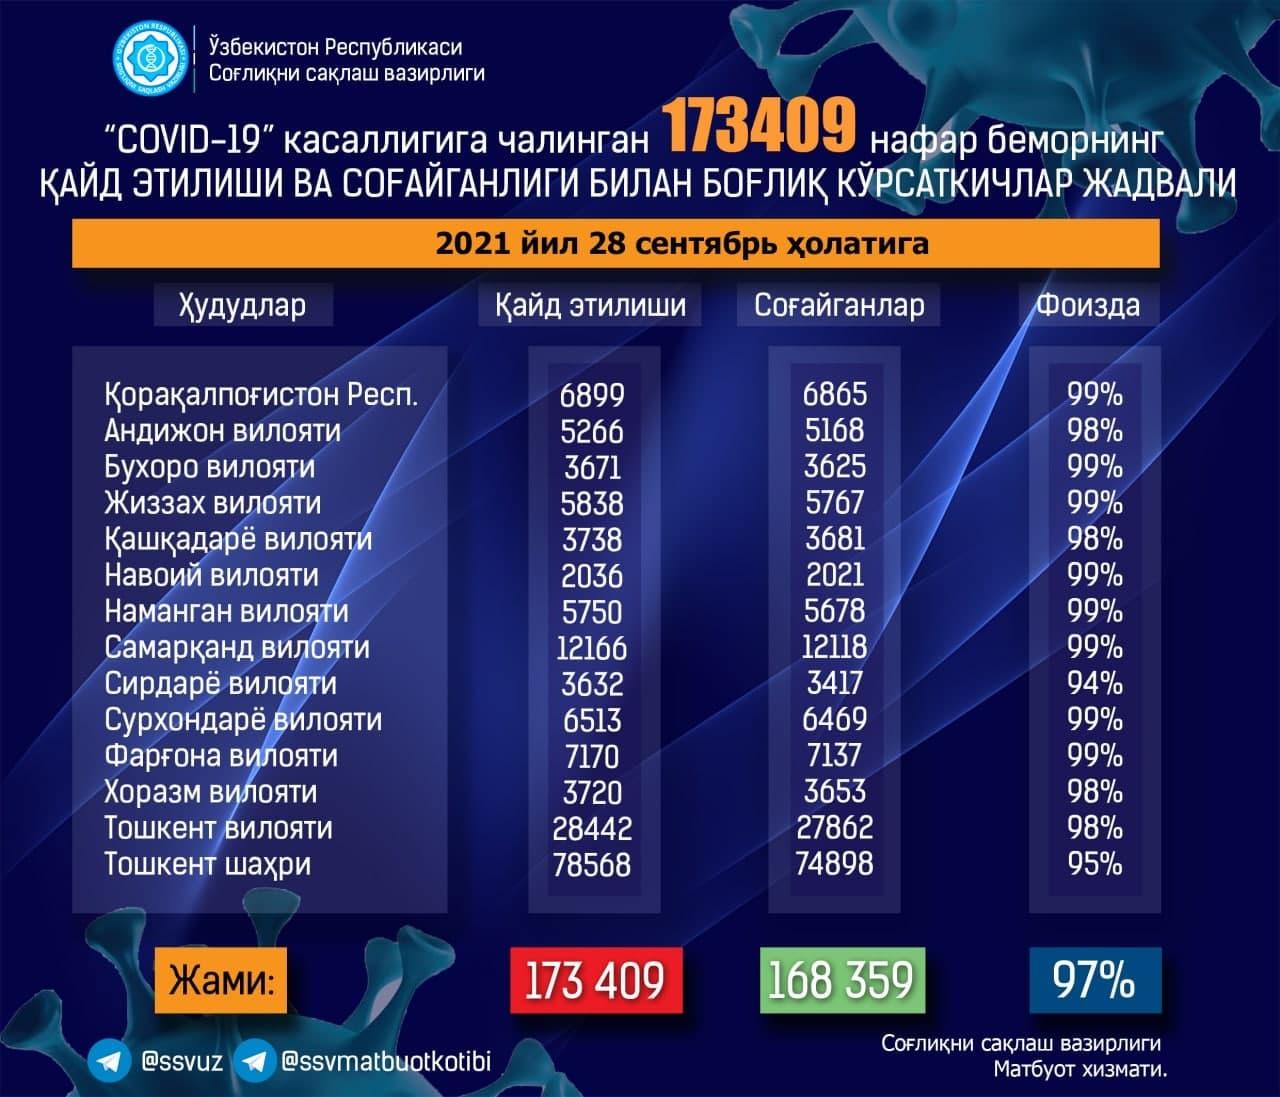 В Узбекистане возобновляется рост заражений коронавирусом — статистика